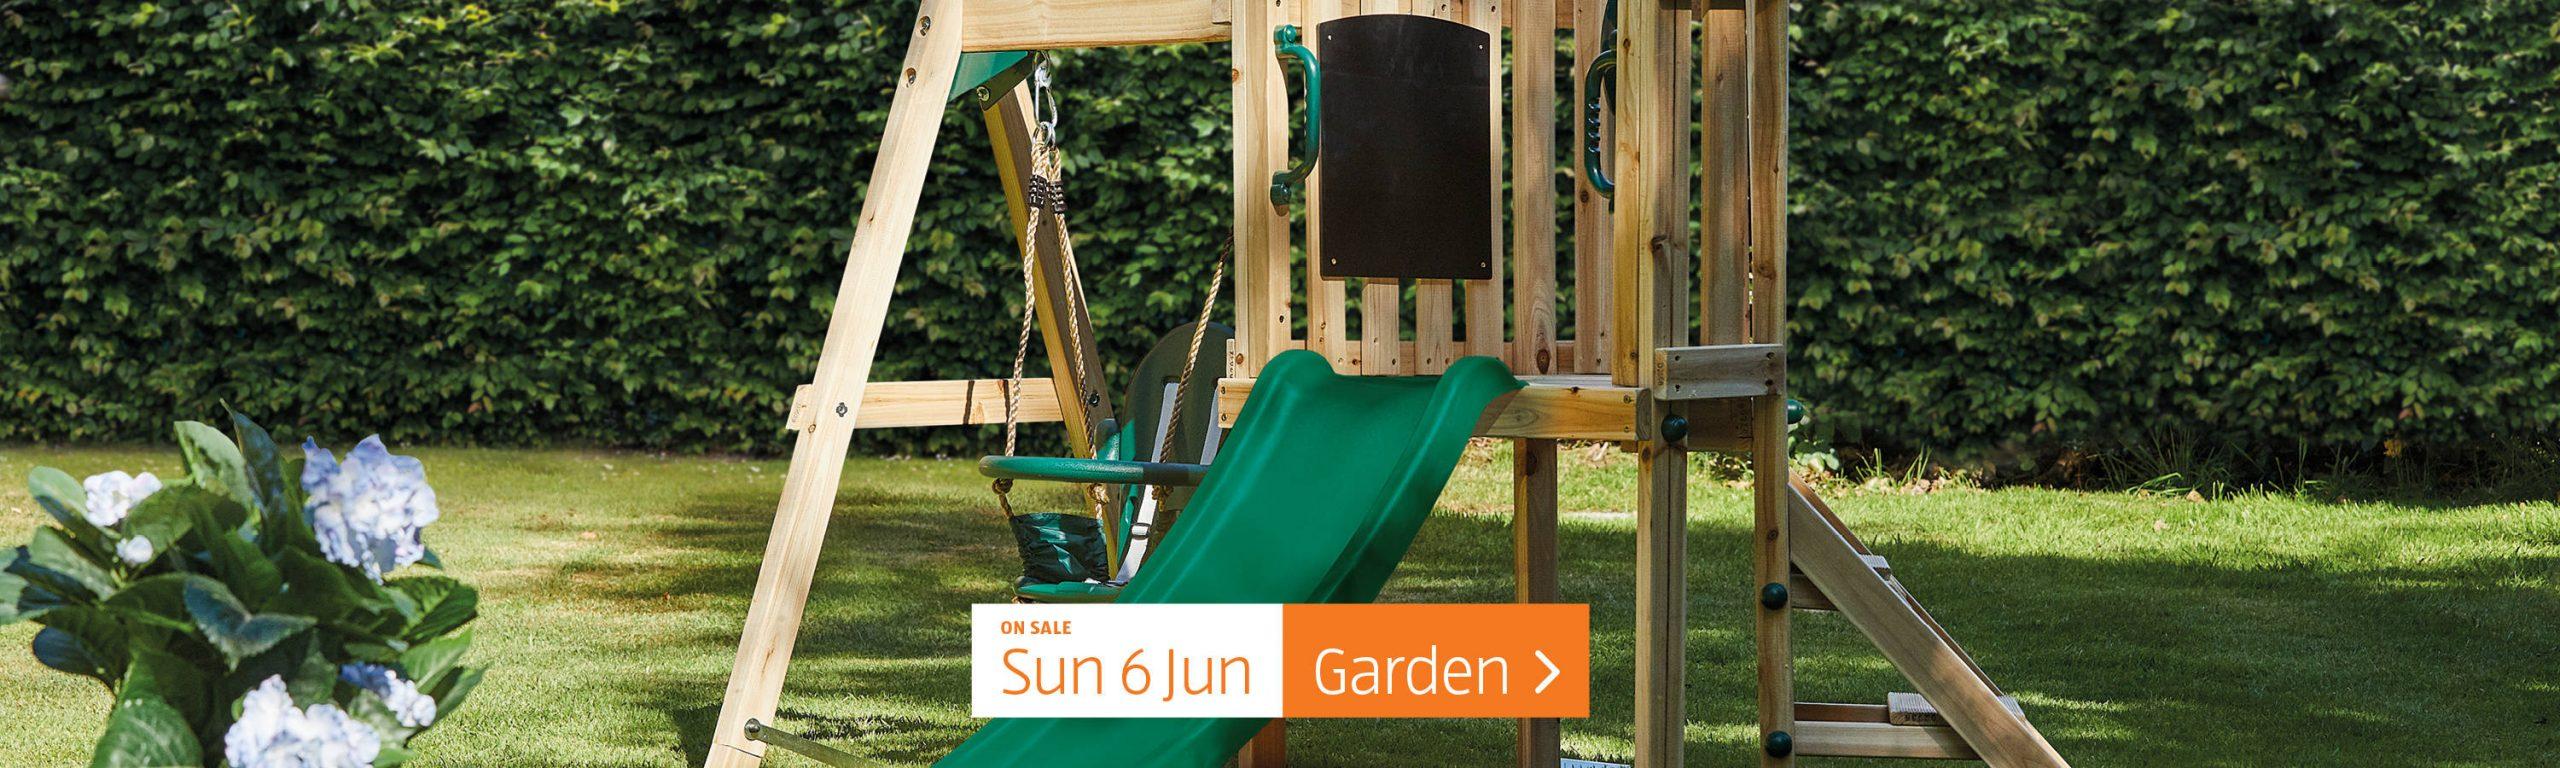 ALDI Sunday Offers Garden 6th June 2021